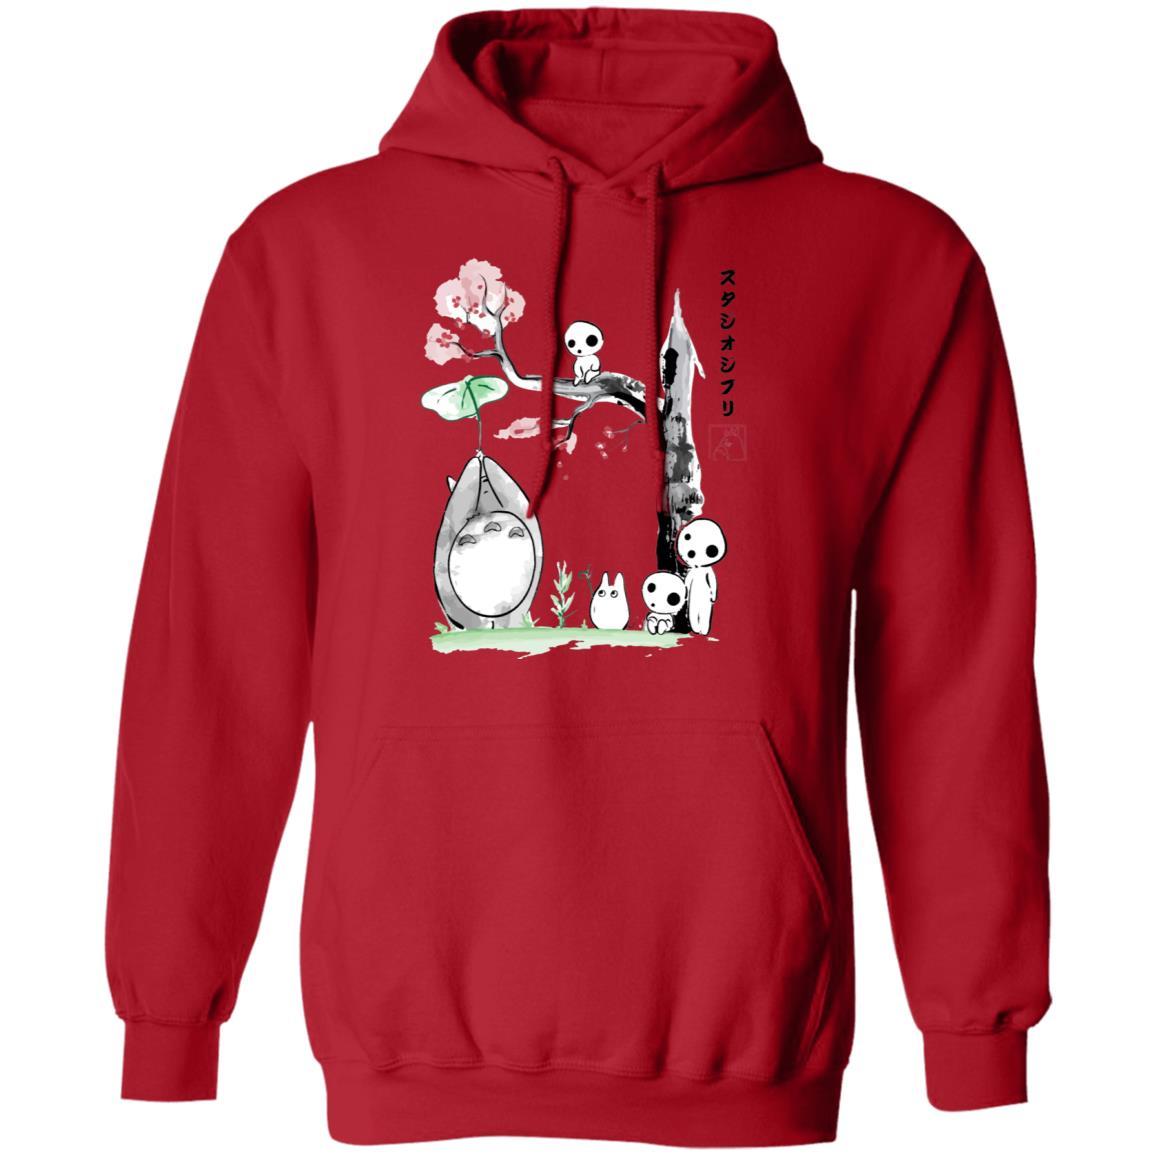 Totoro and the Tree Spirits Hoodie